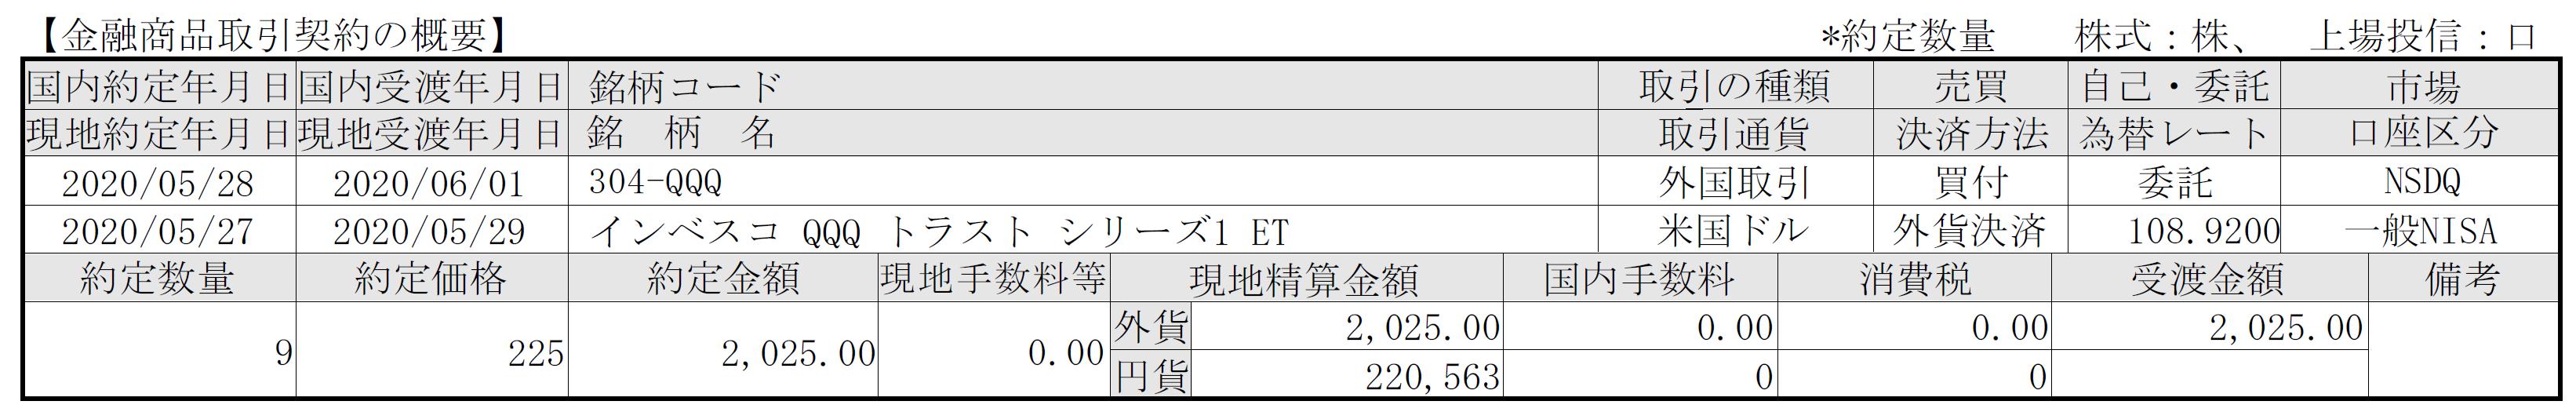 f:id:hodo-work:20200603211029p:plain